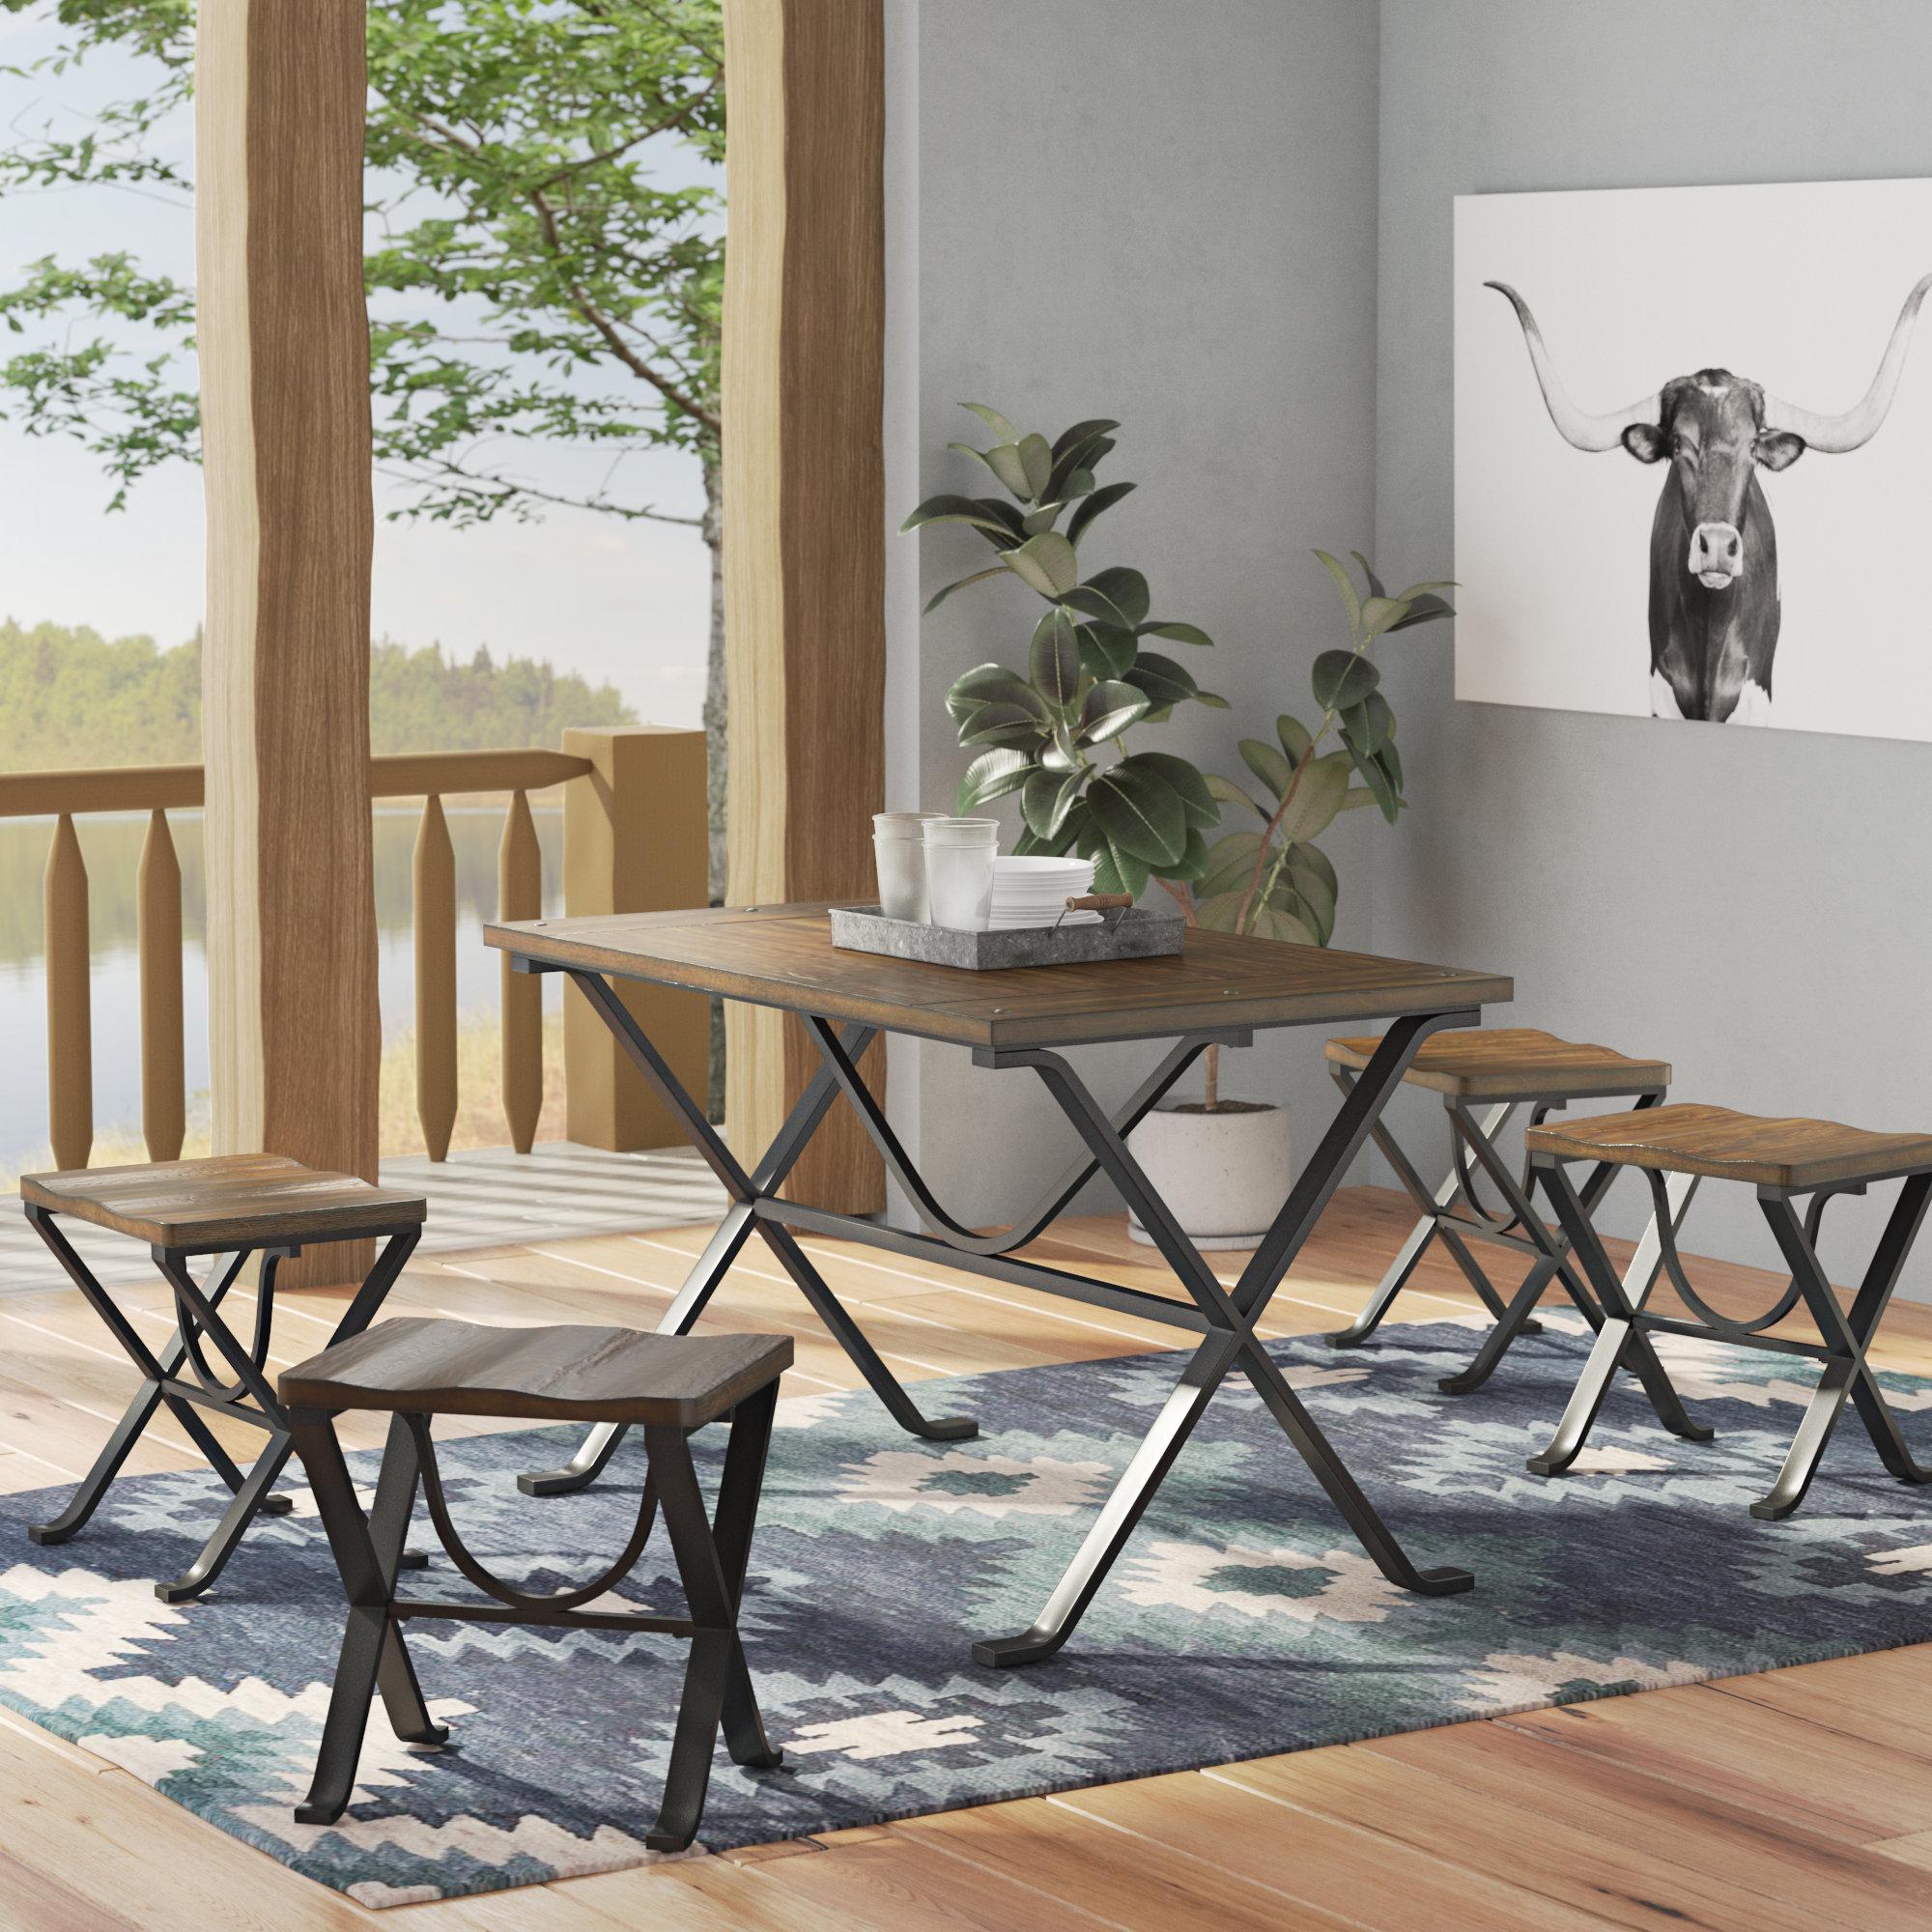 Casiano 5 Piece Dining Sets Regarding Latest Trent Austin Design Aguiar 5 Piece Dining Set & Reviews (View 4 of 20)